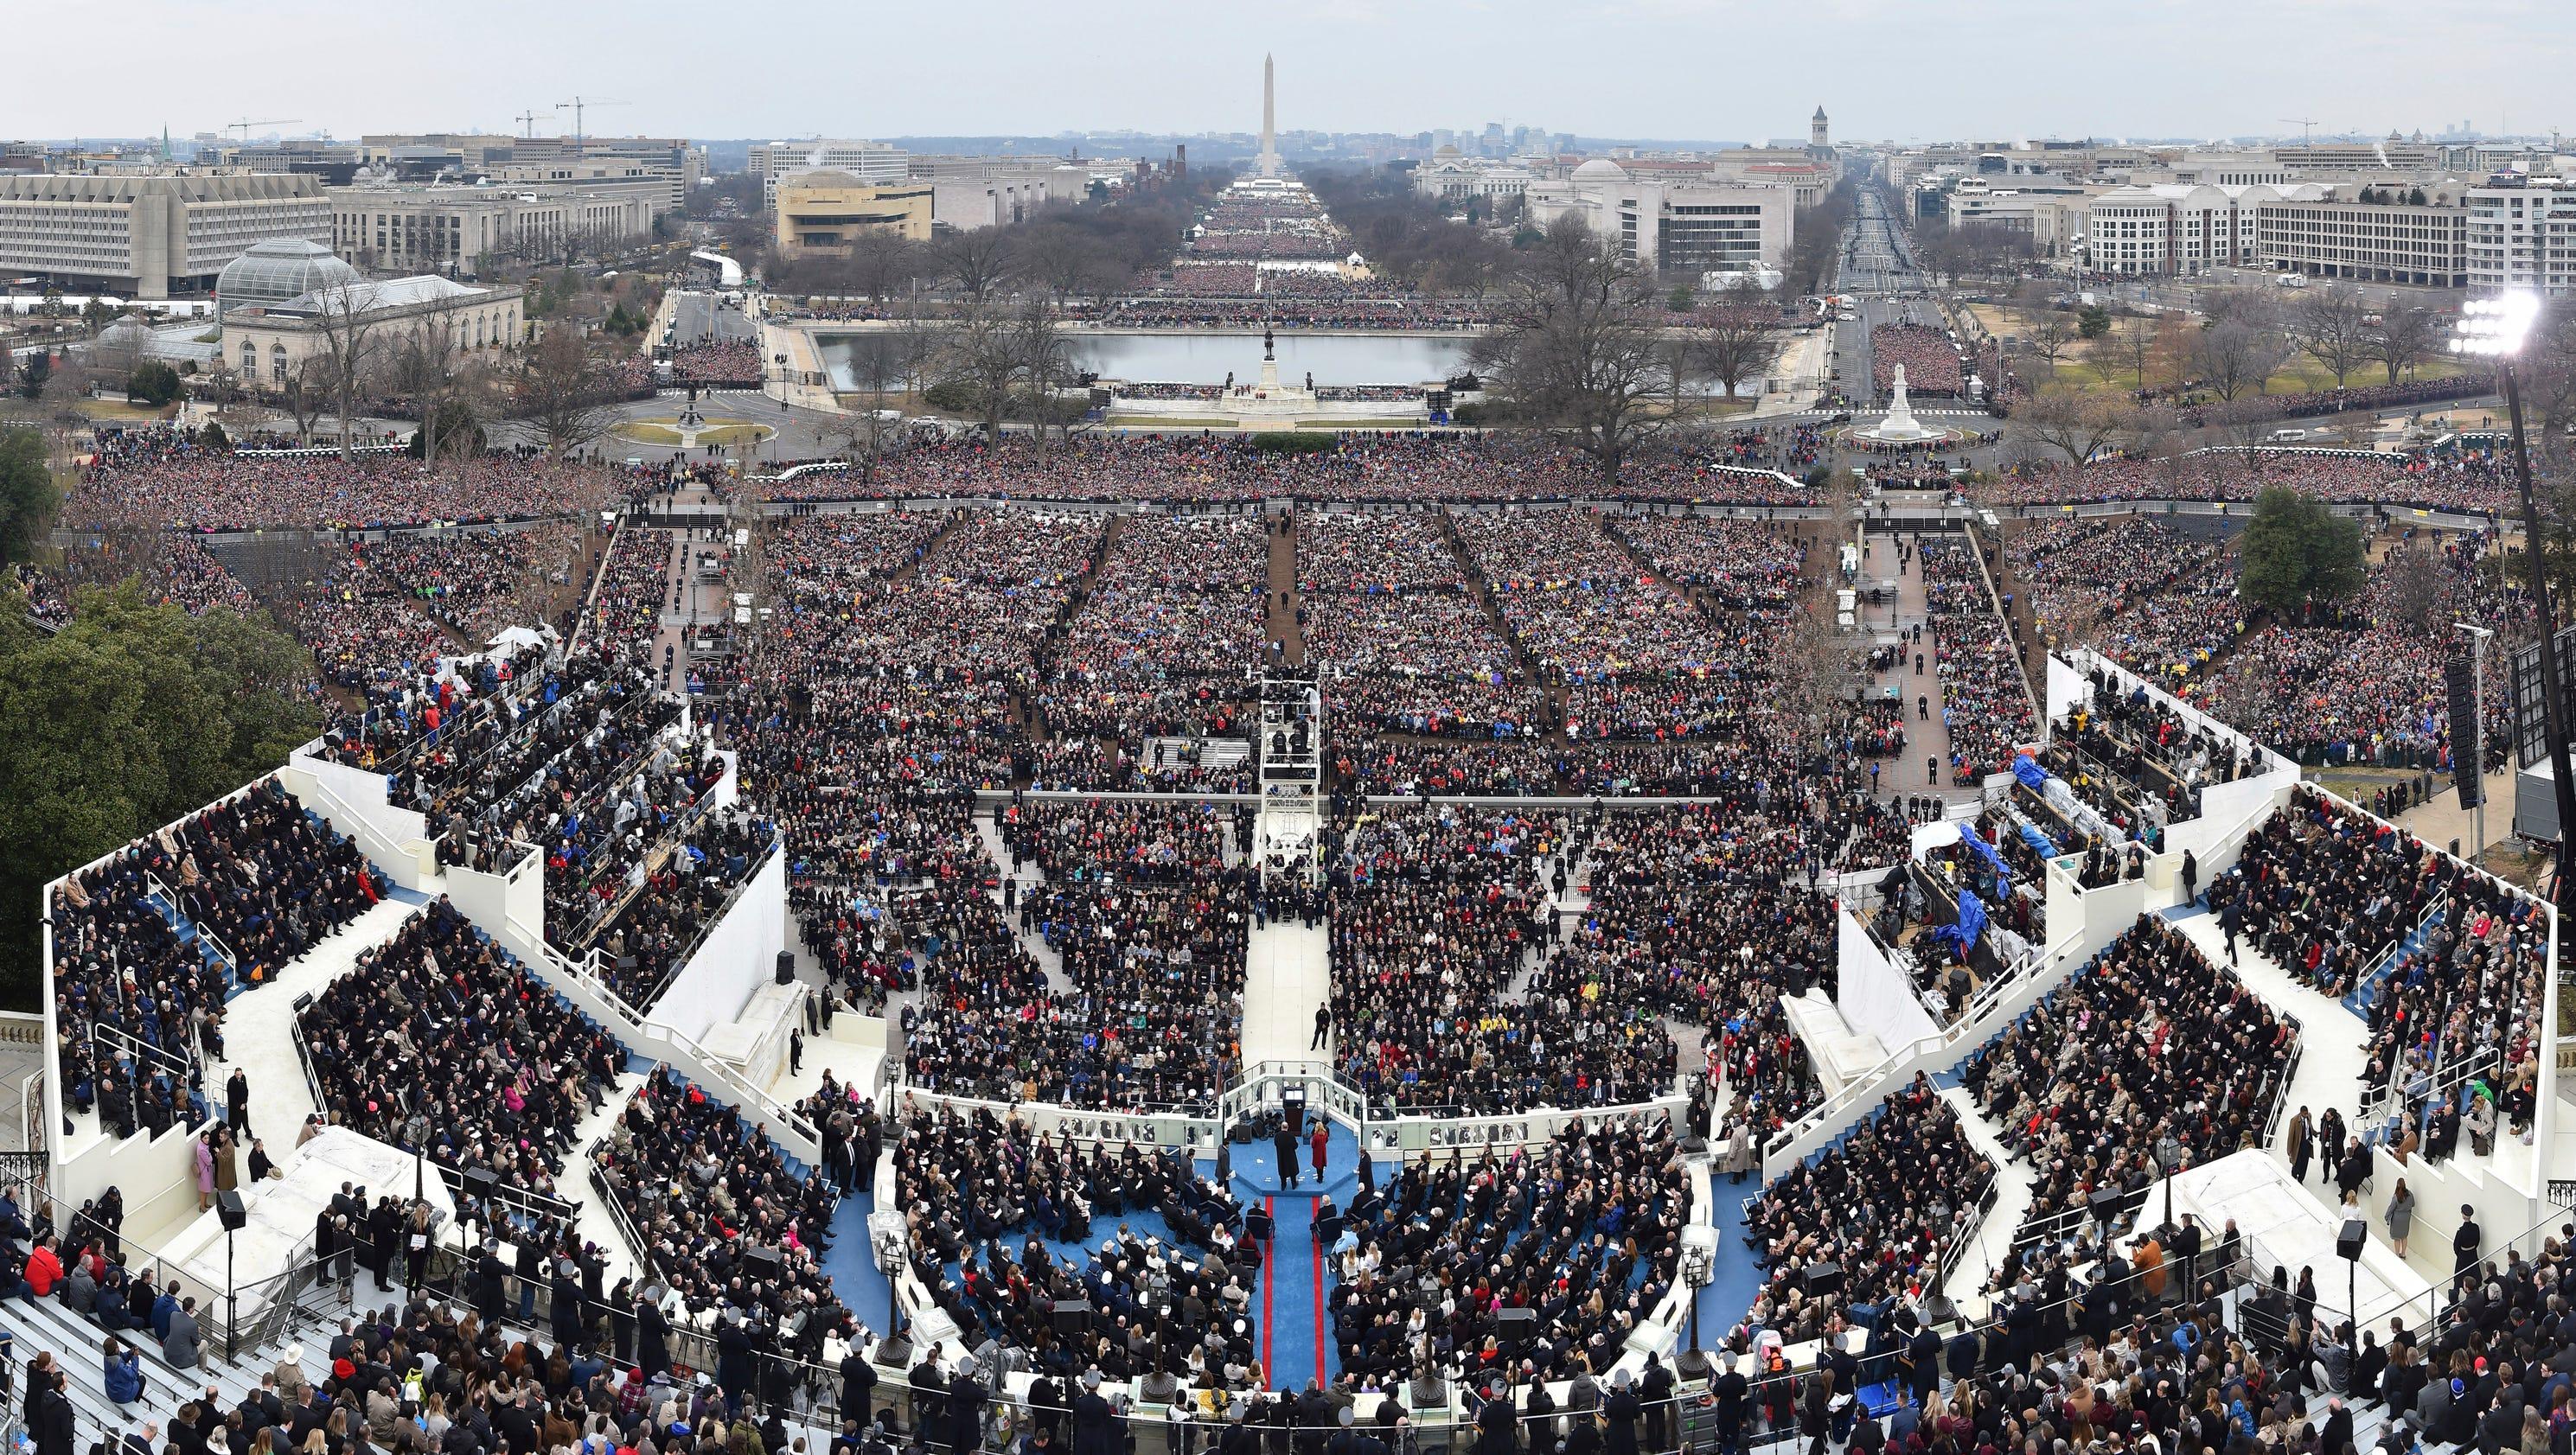 636210589629747867-AP-Trump-Inauguration